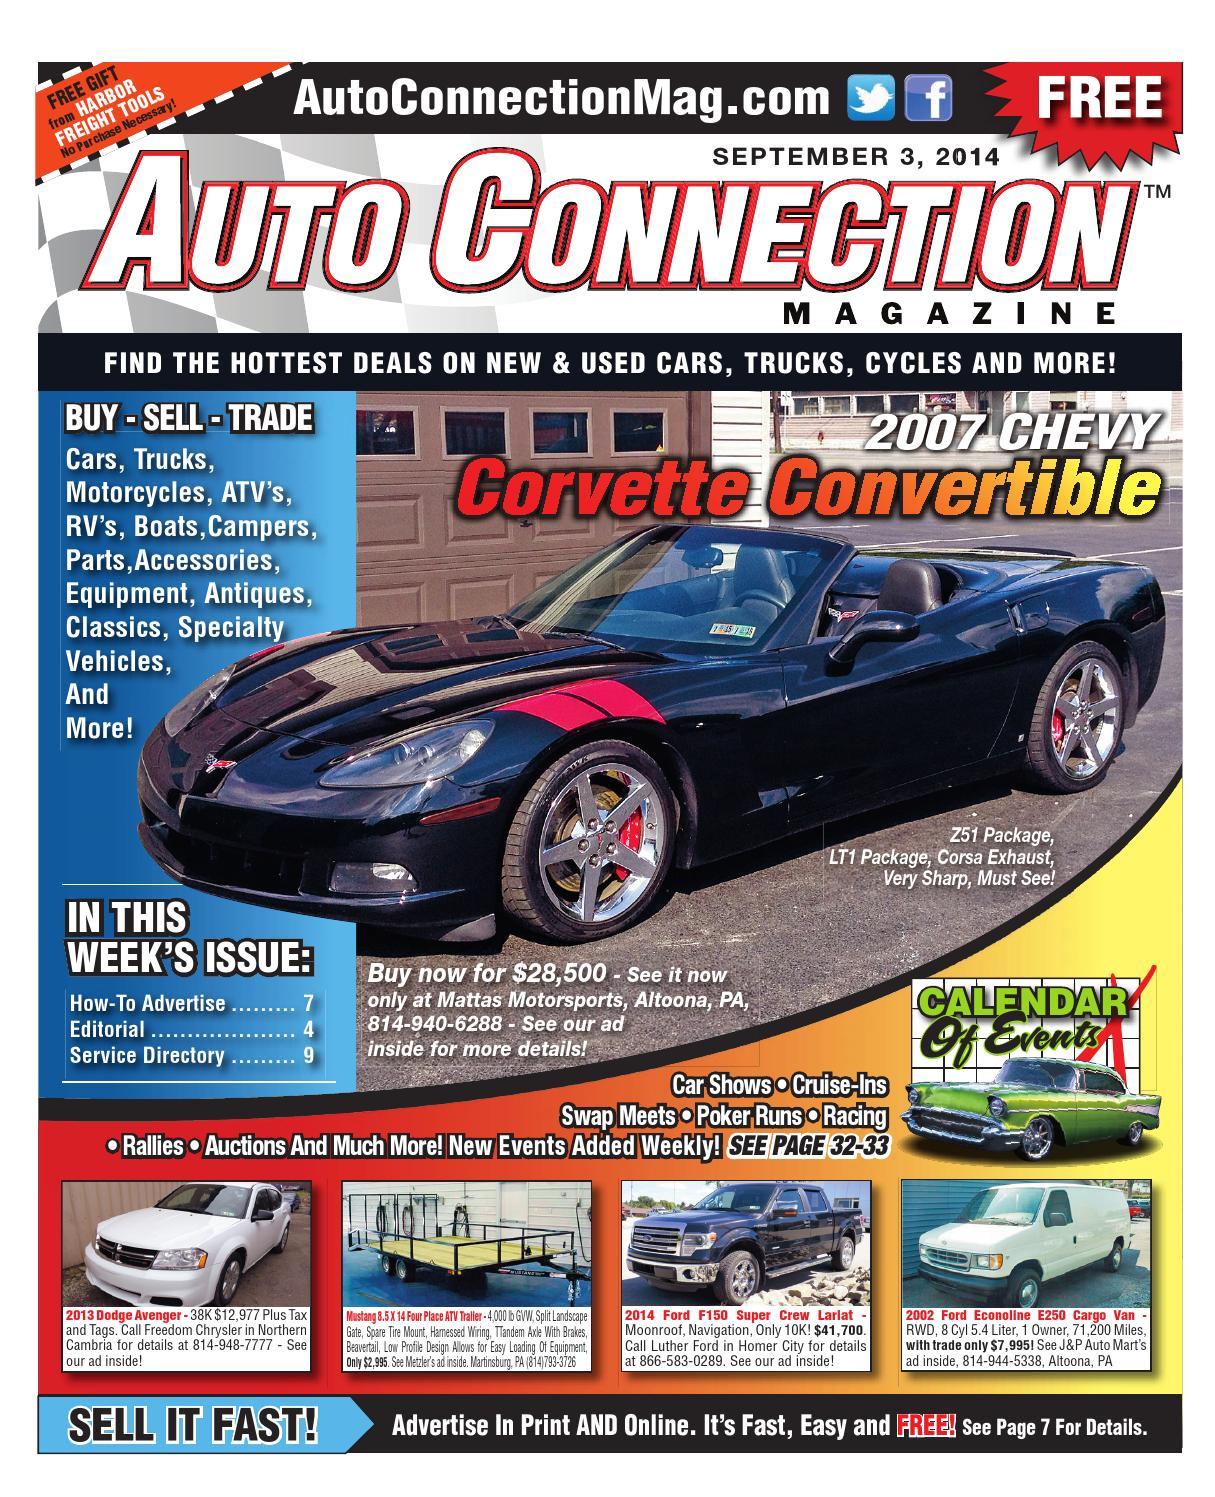 Chrysler Rear Park Assist Sensor 07-09 Aspen Durango Town/&Country Grand Caravan